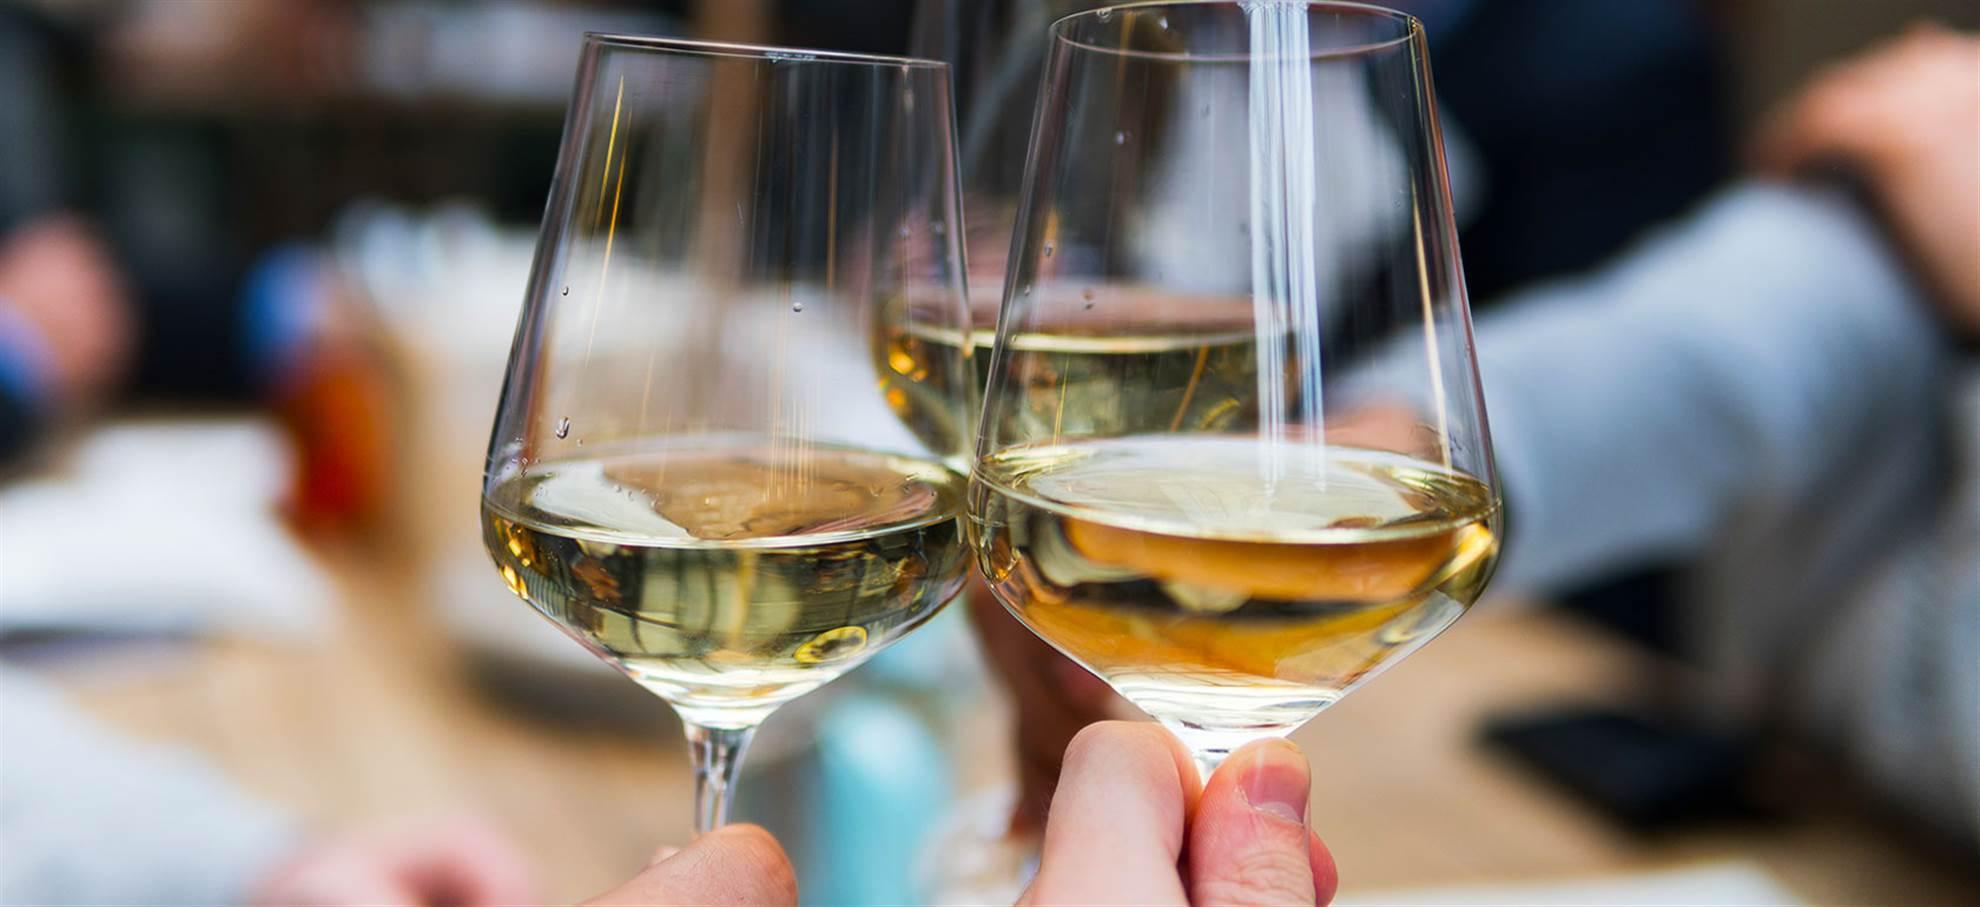 Dégustation de vin catalan